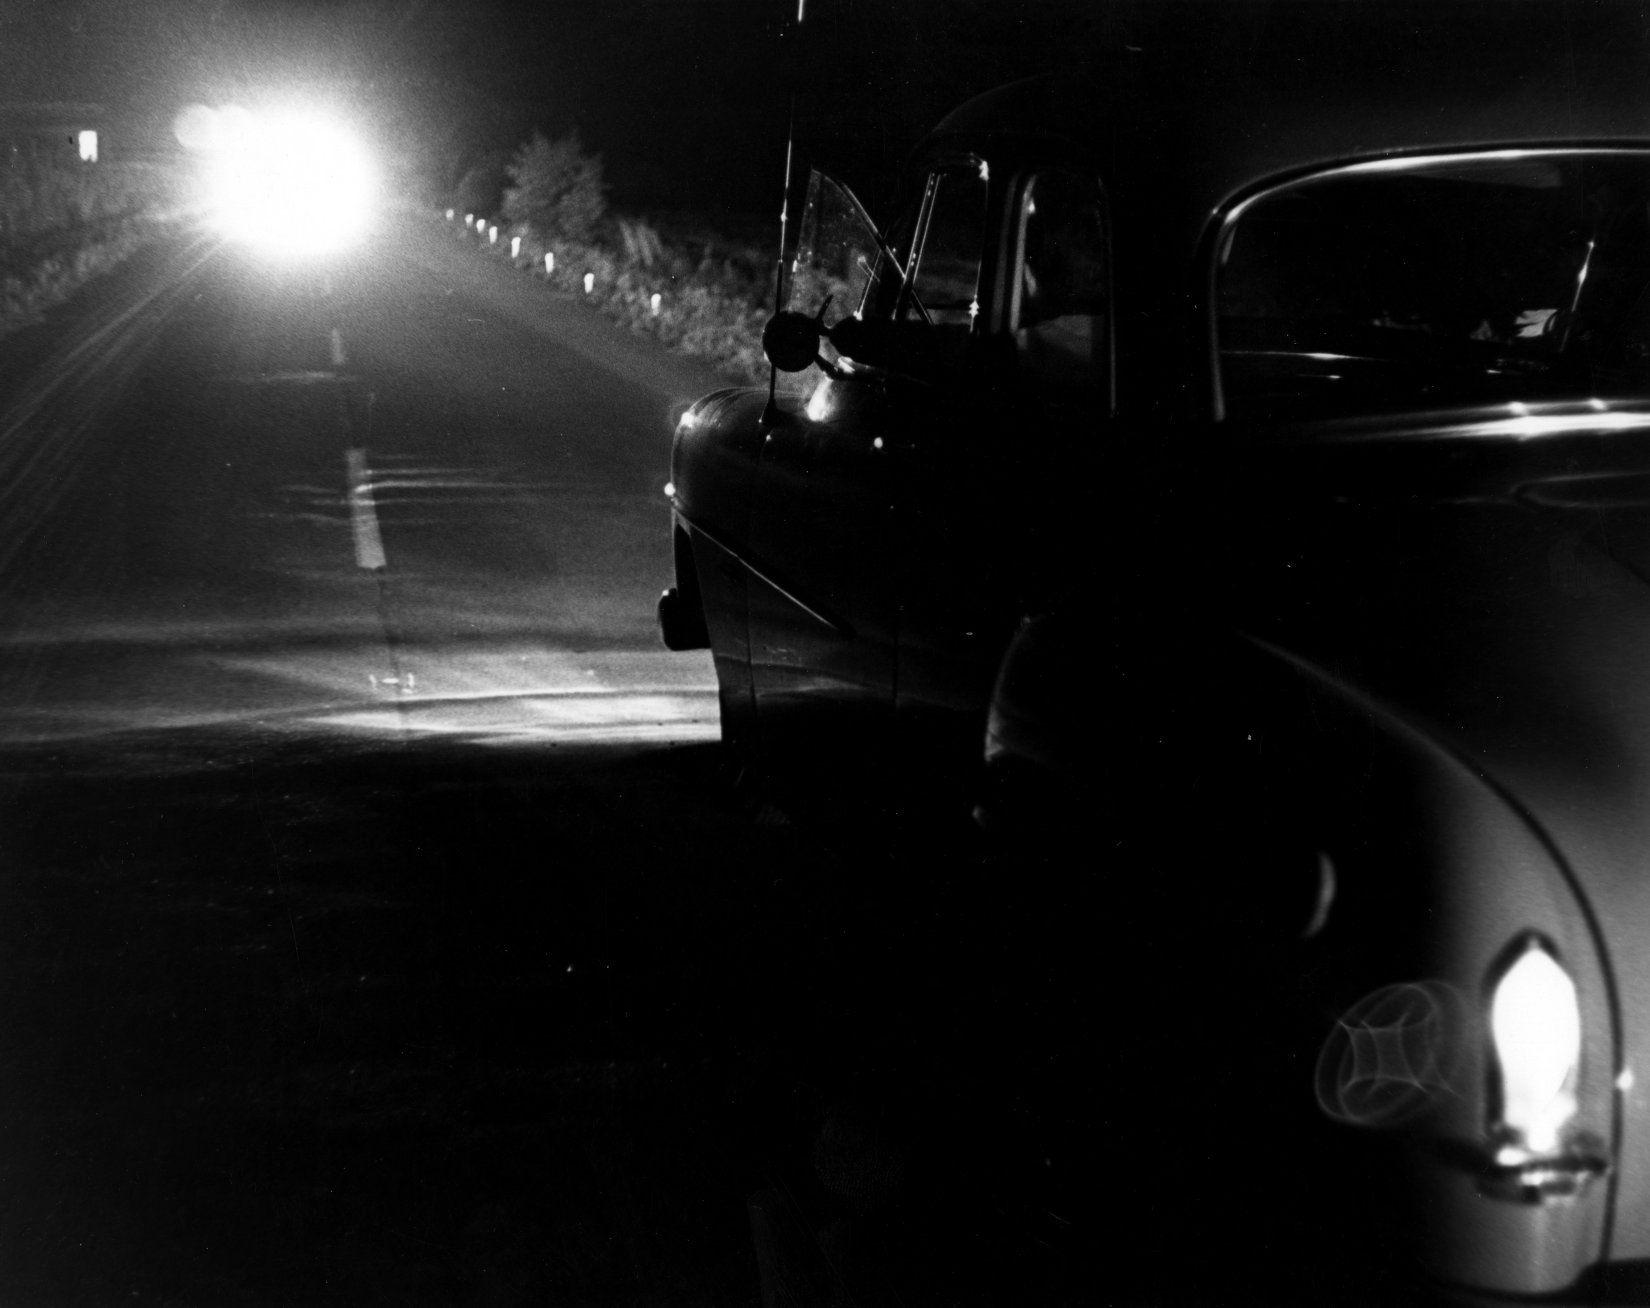 NCSU, Civil Engineering, highway research 1940 #AEC